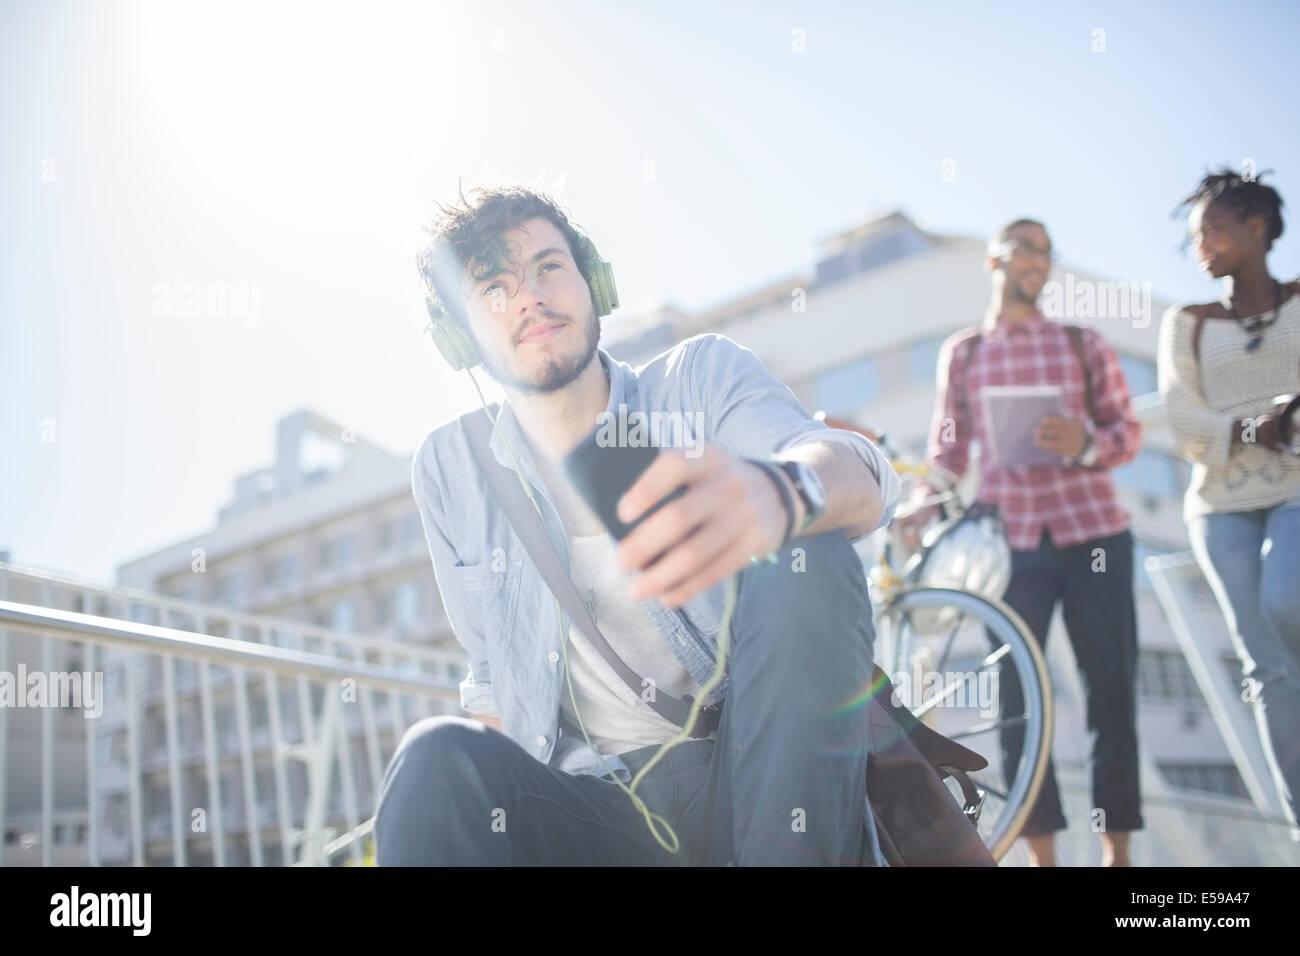 Man listening to headphones on city street - Stock Image